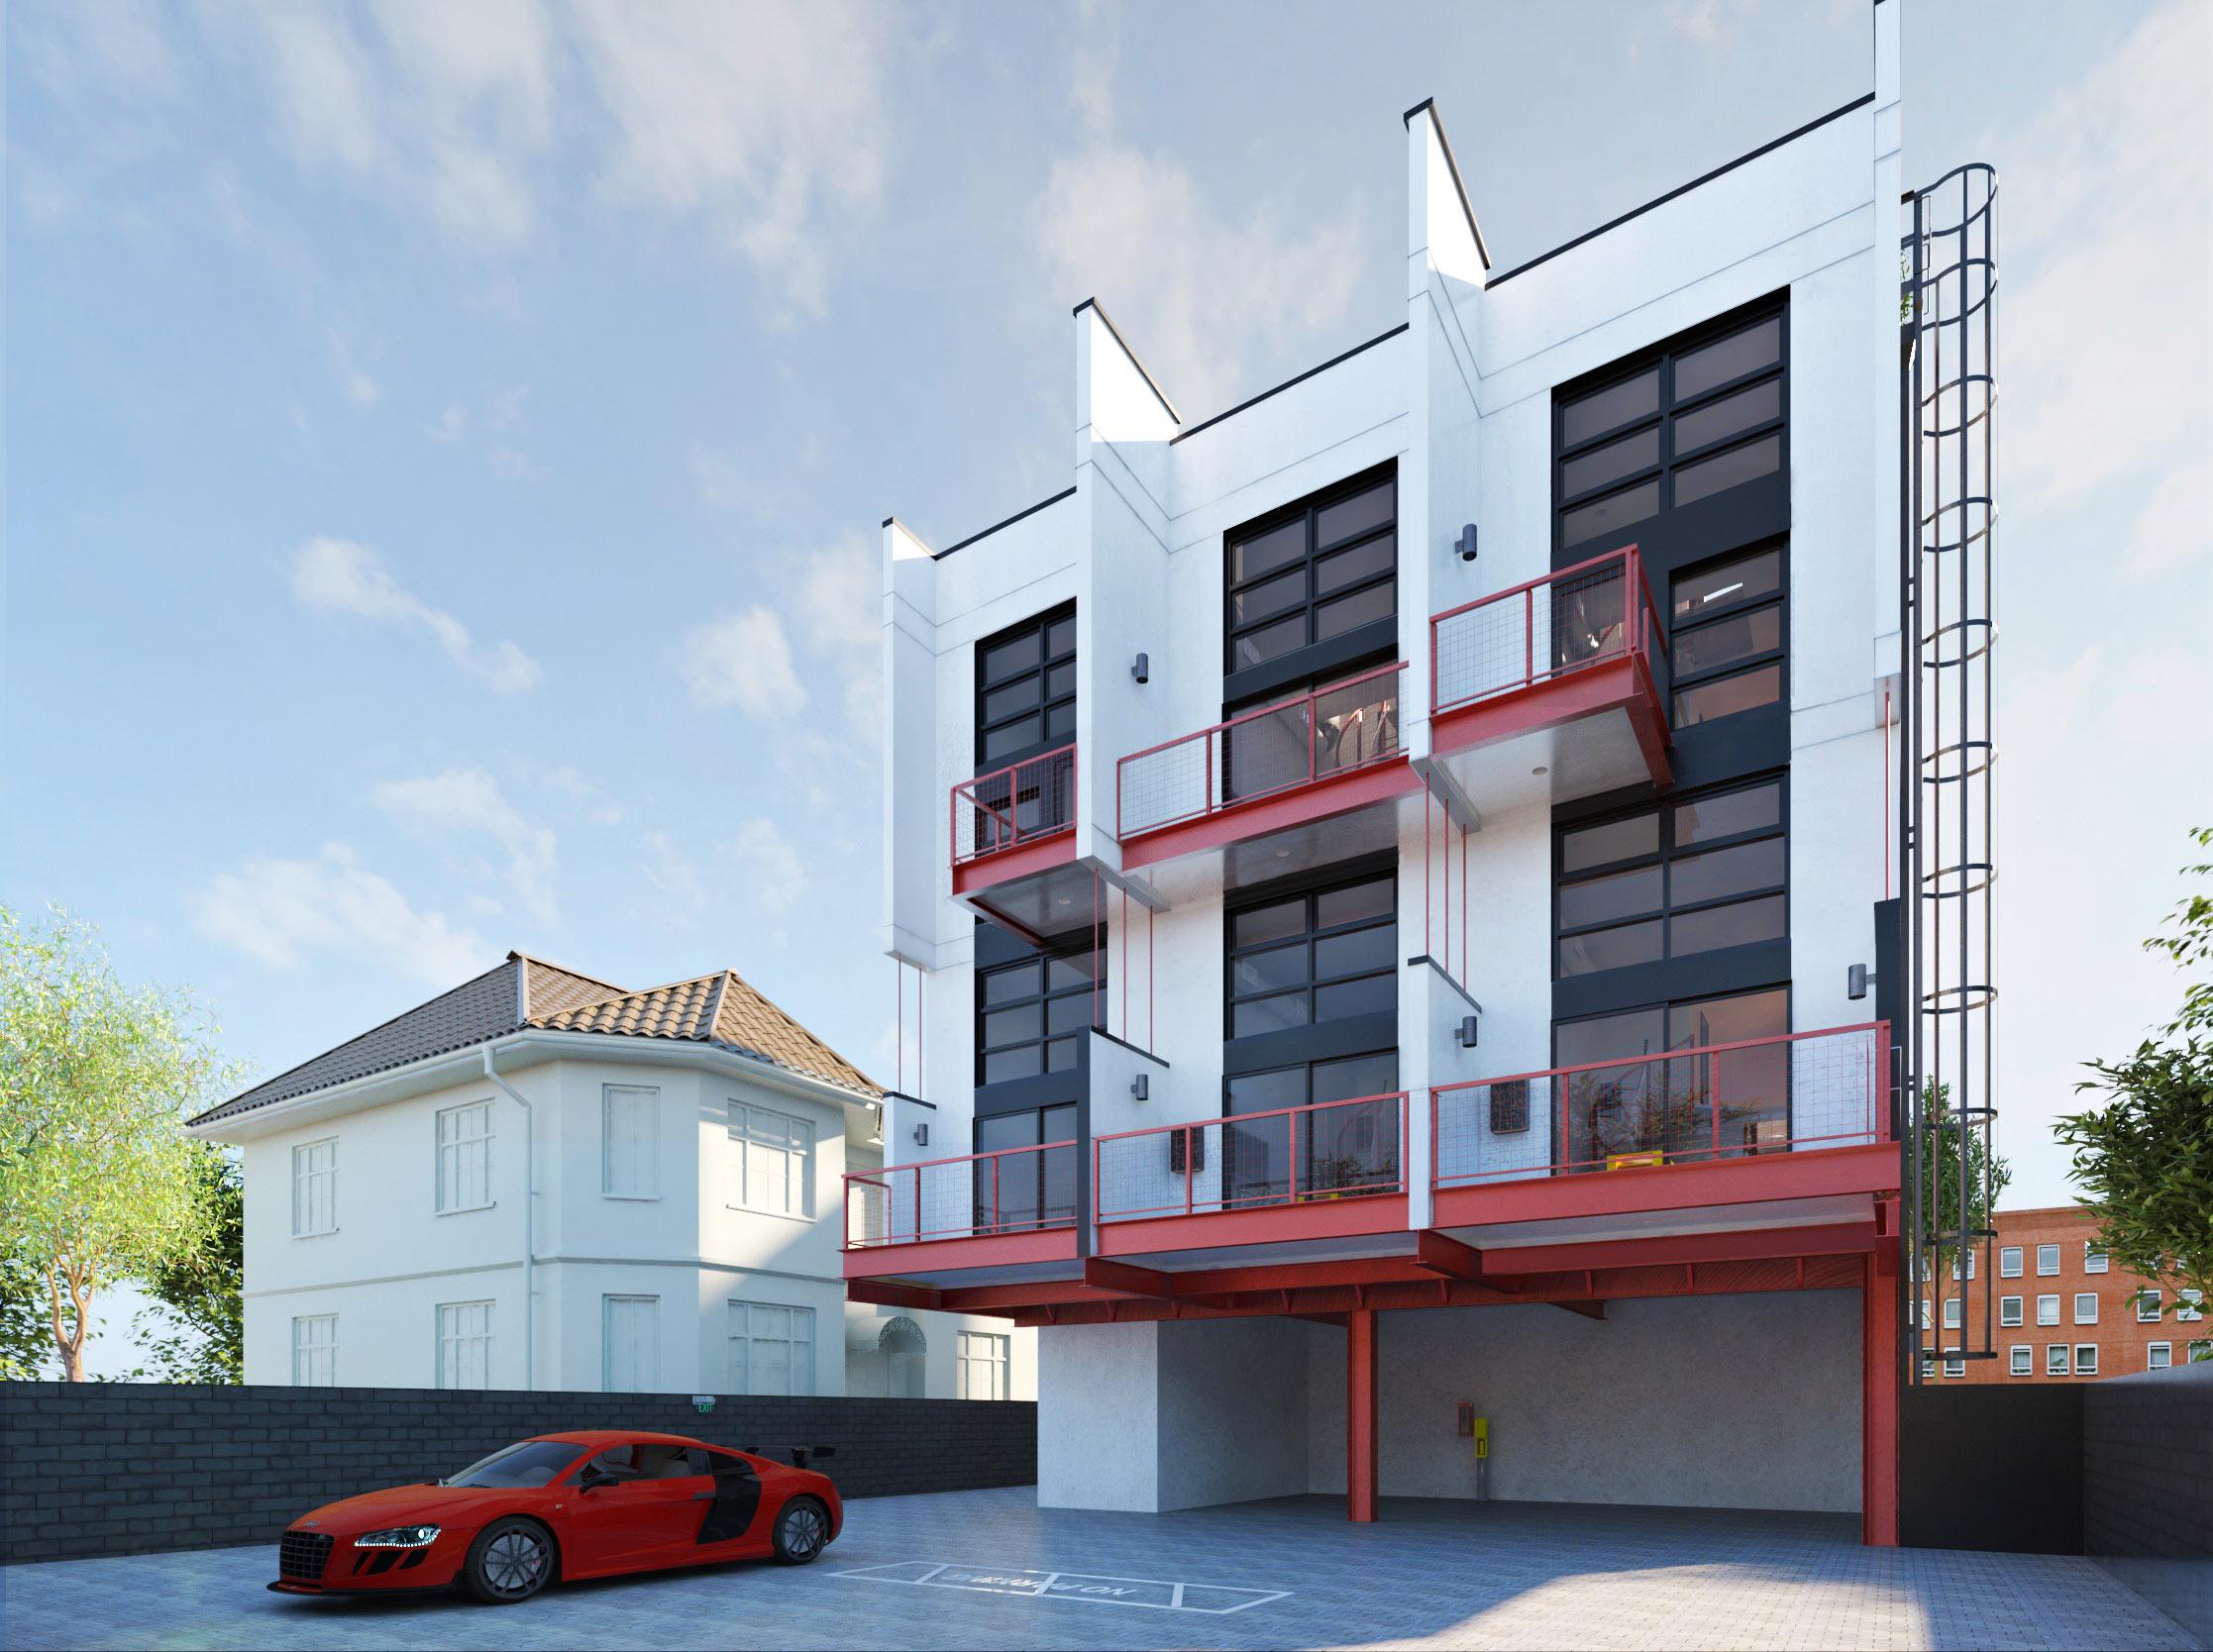 noho10-apartments-archillusion-design-05.jpg